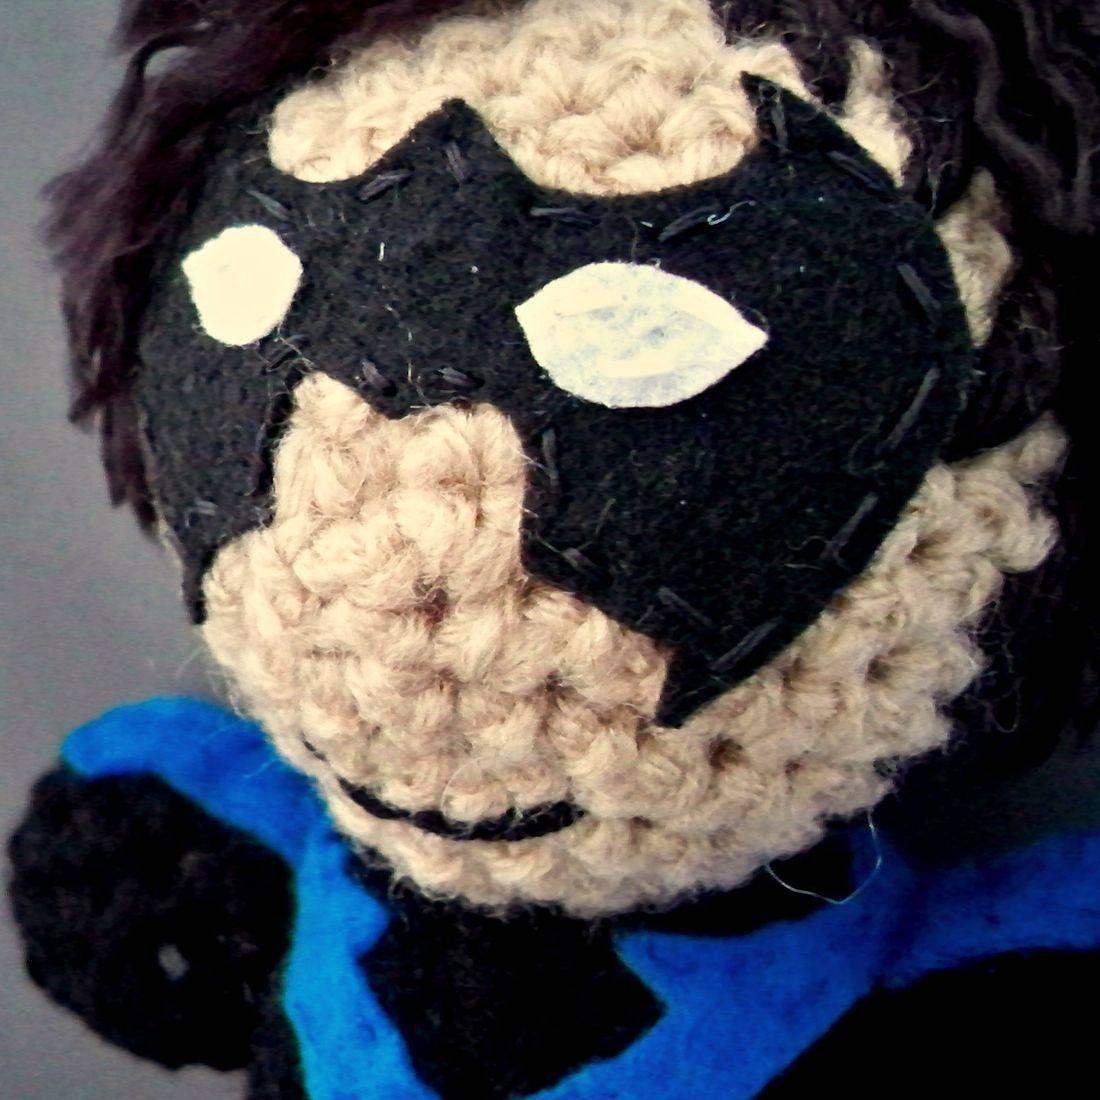 Nightwing, Batman, JLA, JLU, Teen Titans, amigurumi, plush, doll, crochet, handmade, geek, nerd, comicbook, superhero